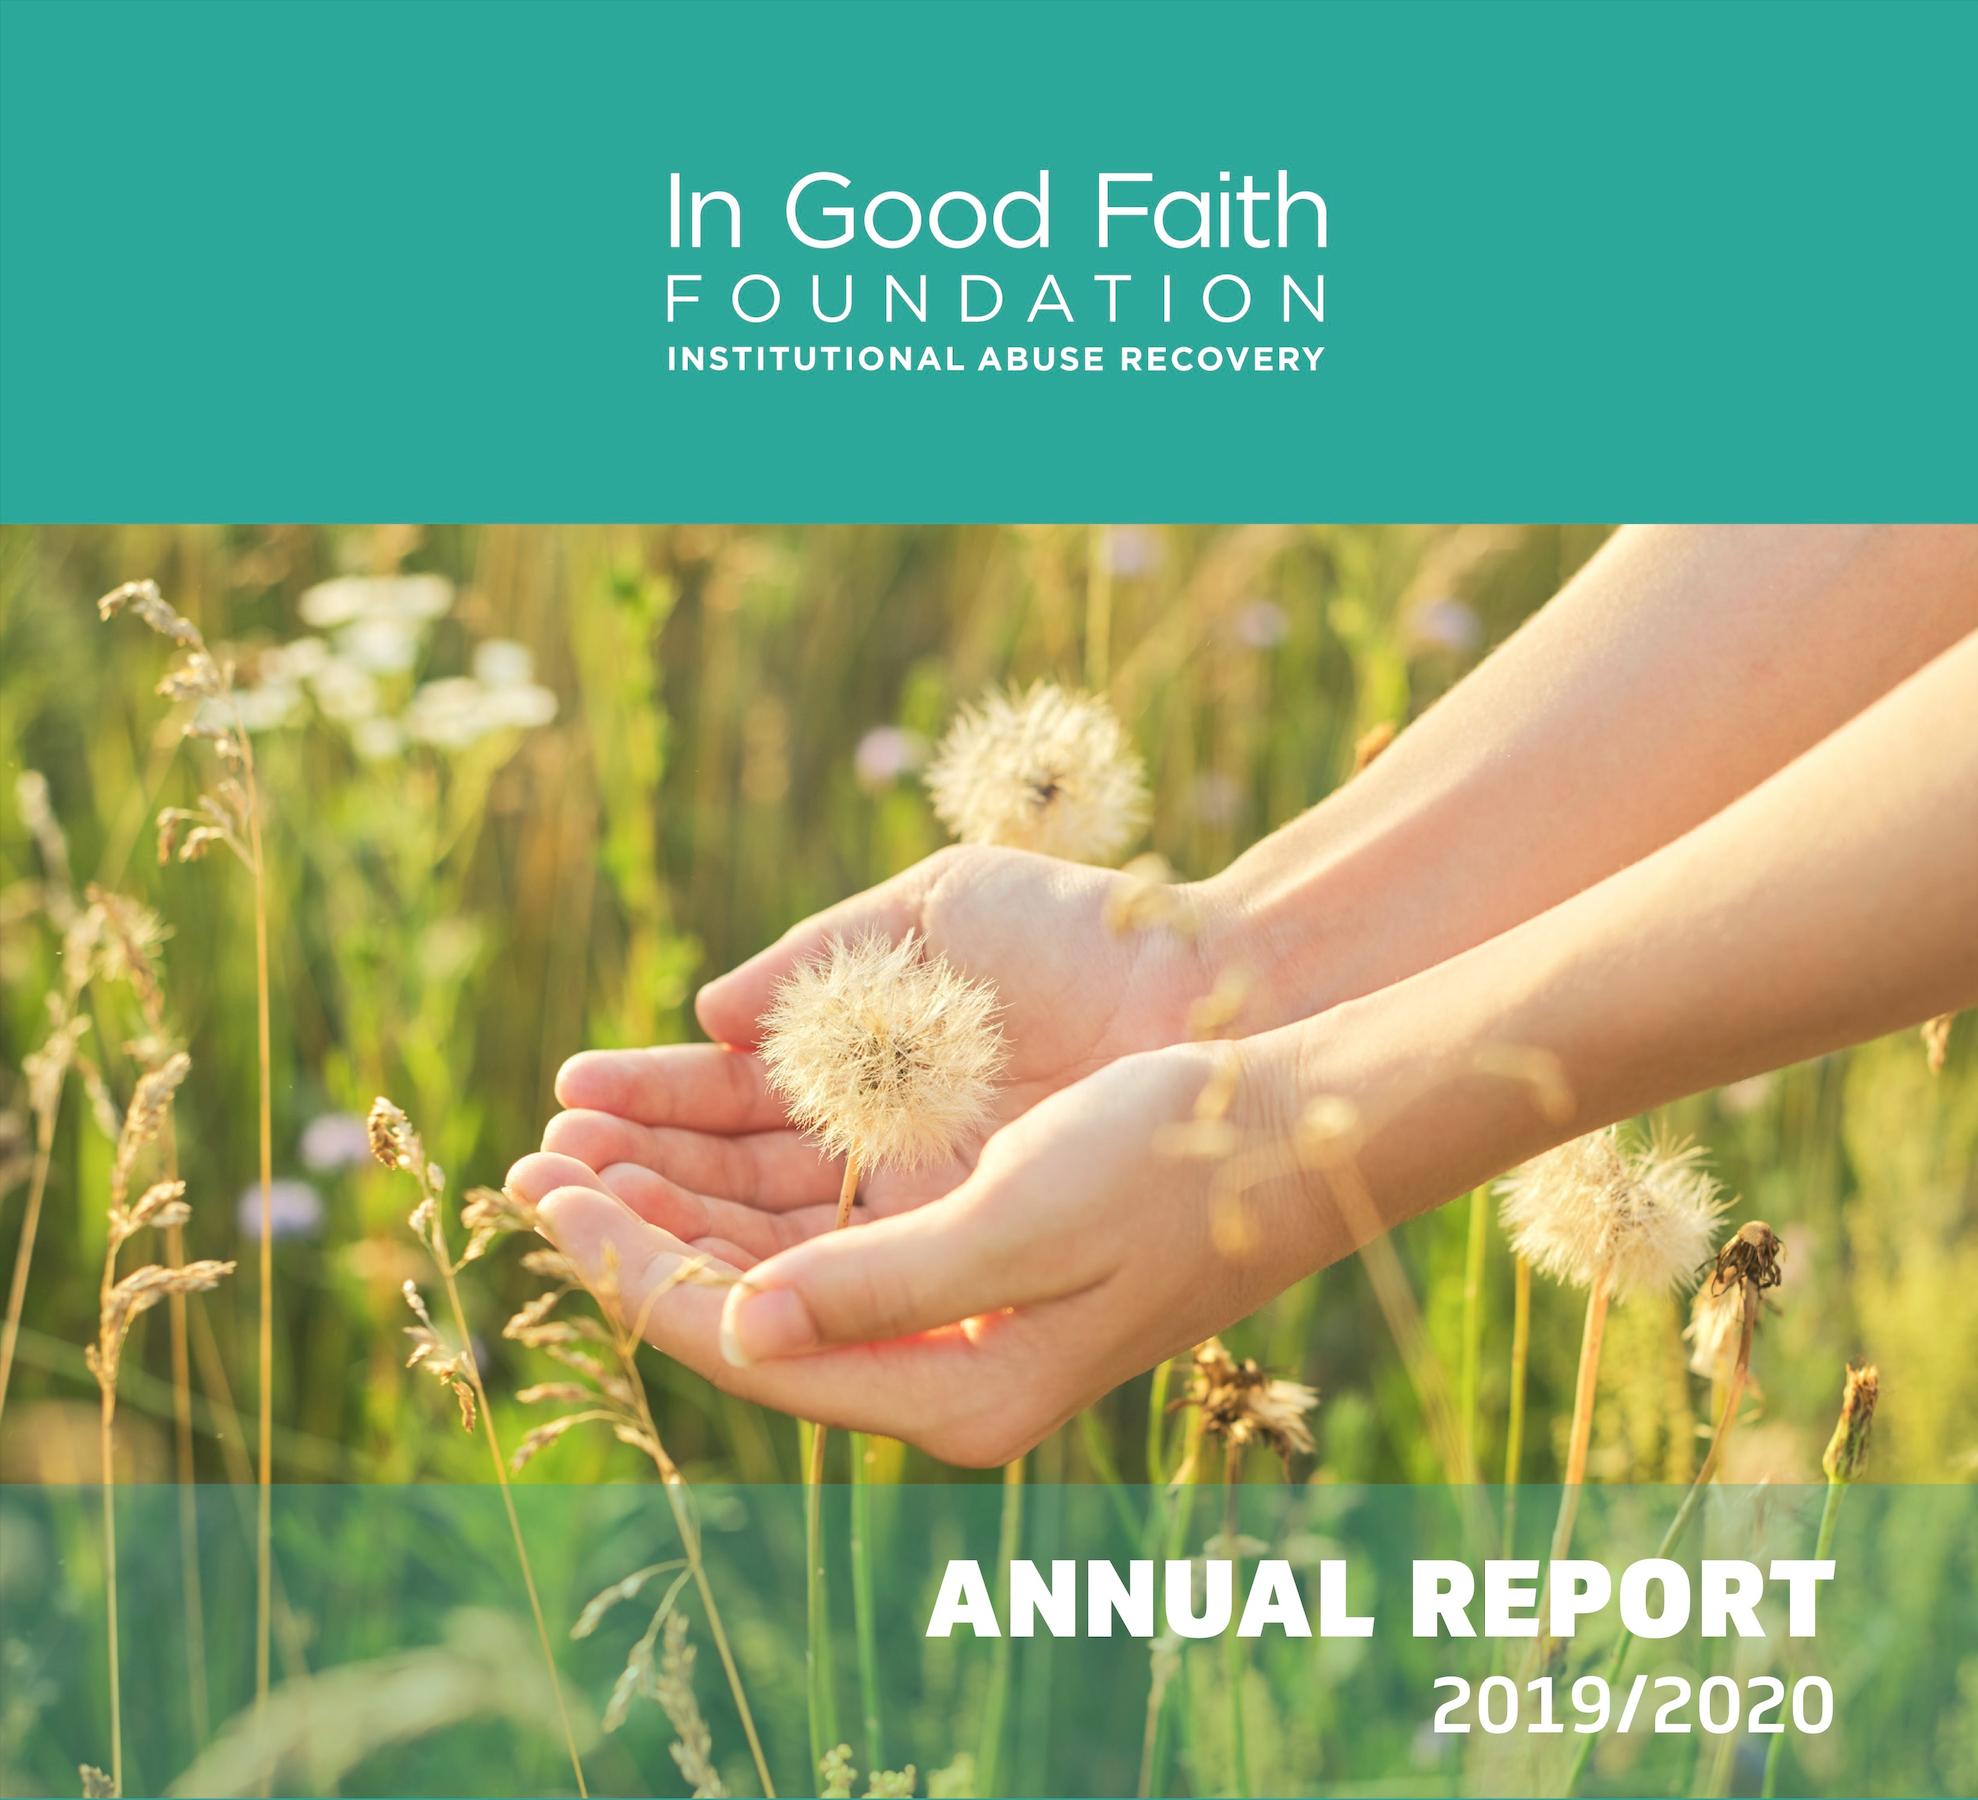 IGFF ANNUAL REPORT